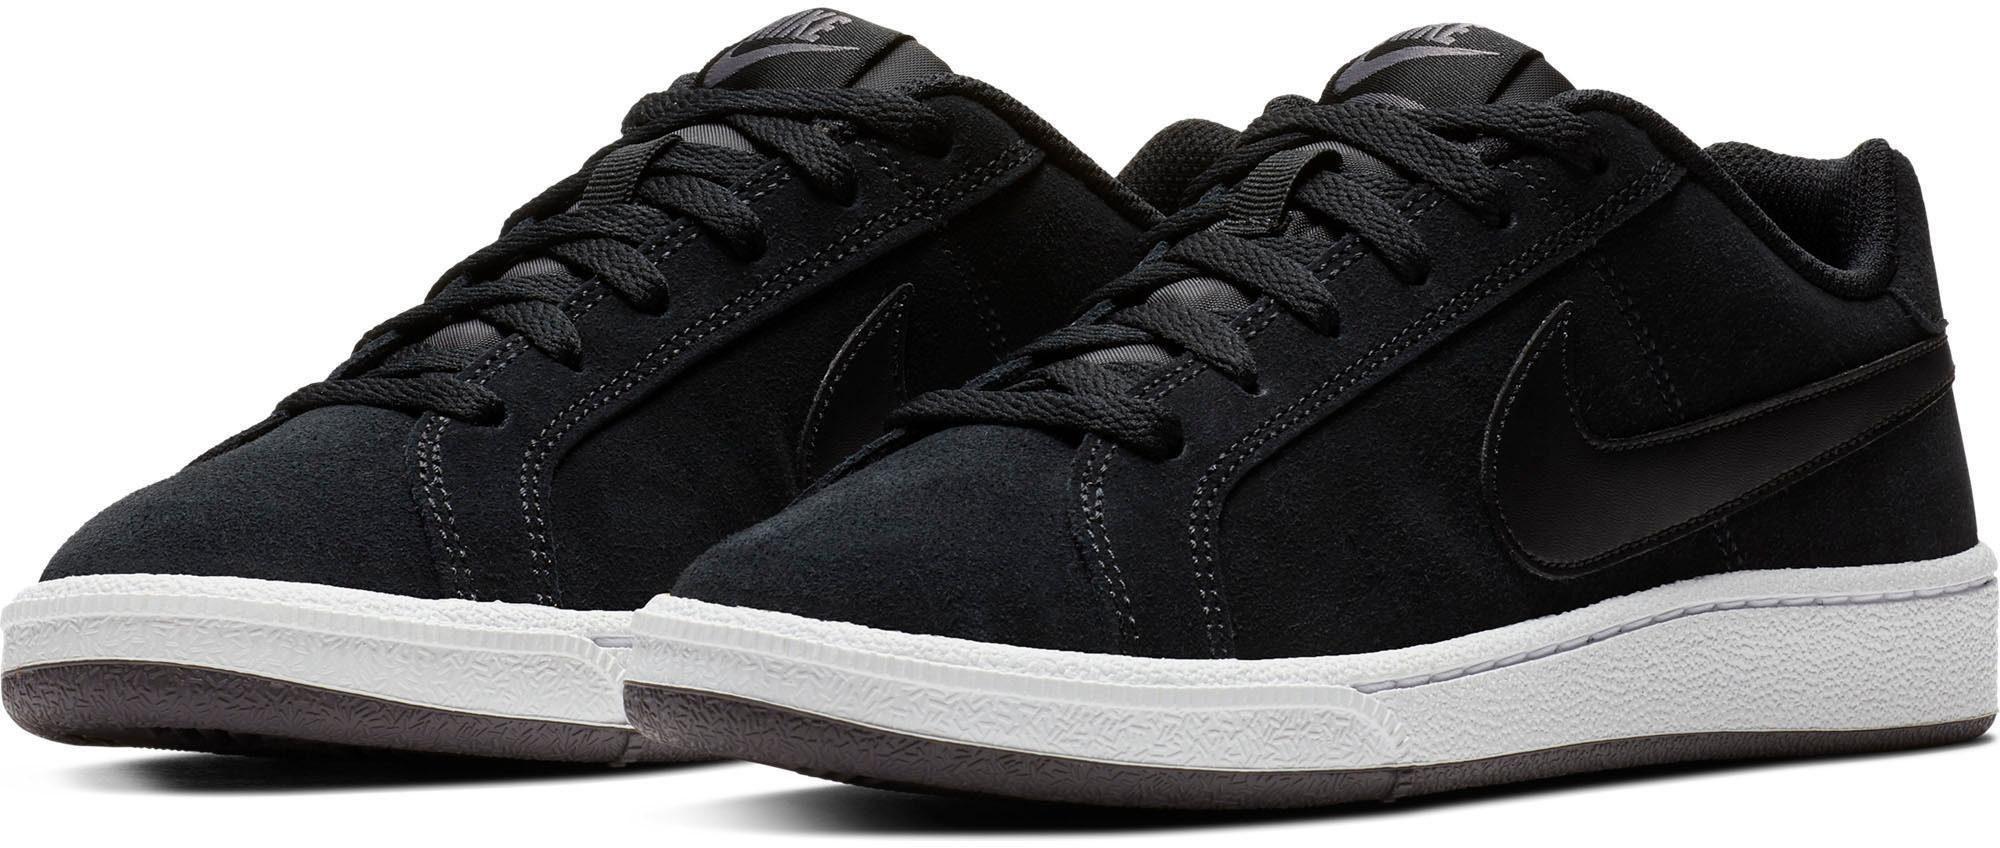 Nike Sportswear »Wmns Court Royale Premium« Sneaker